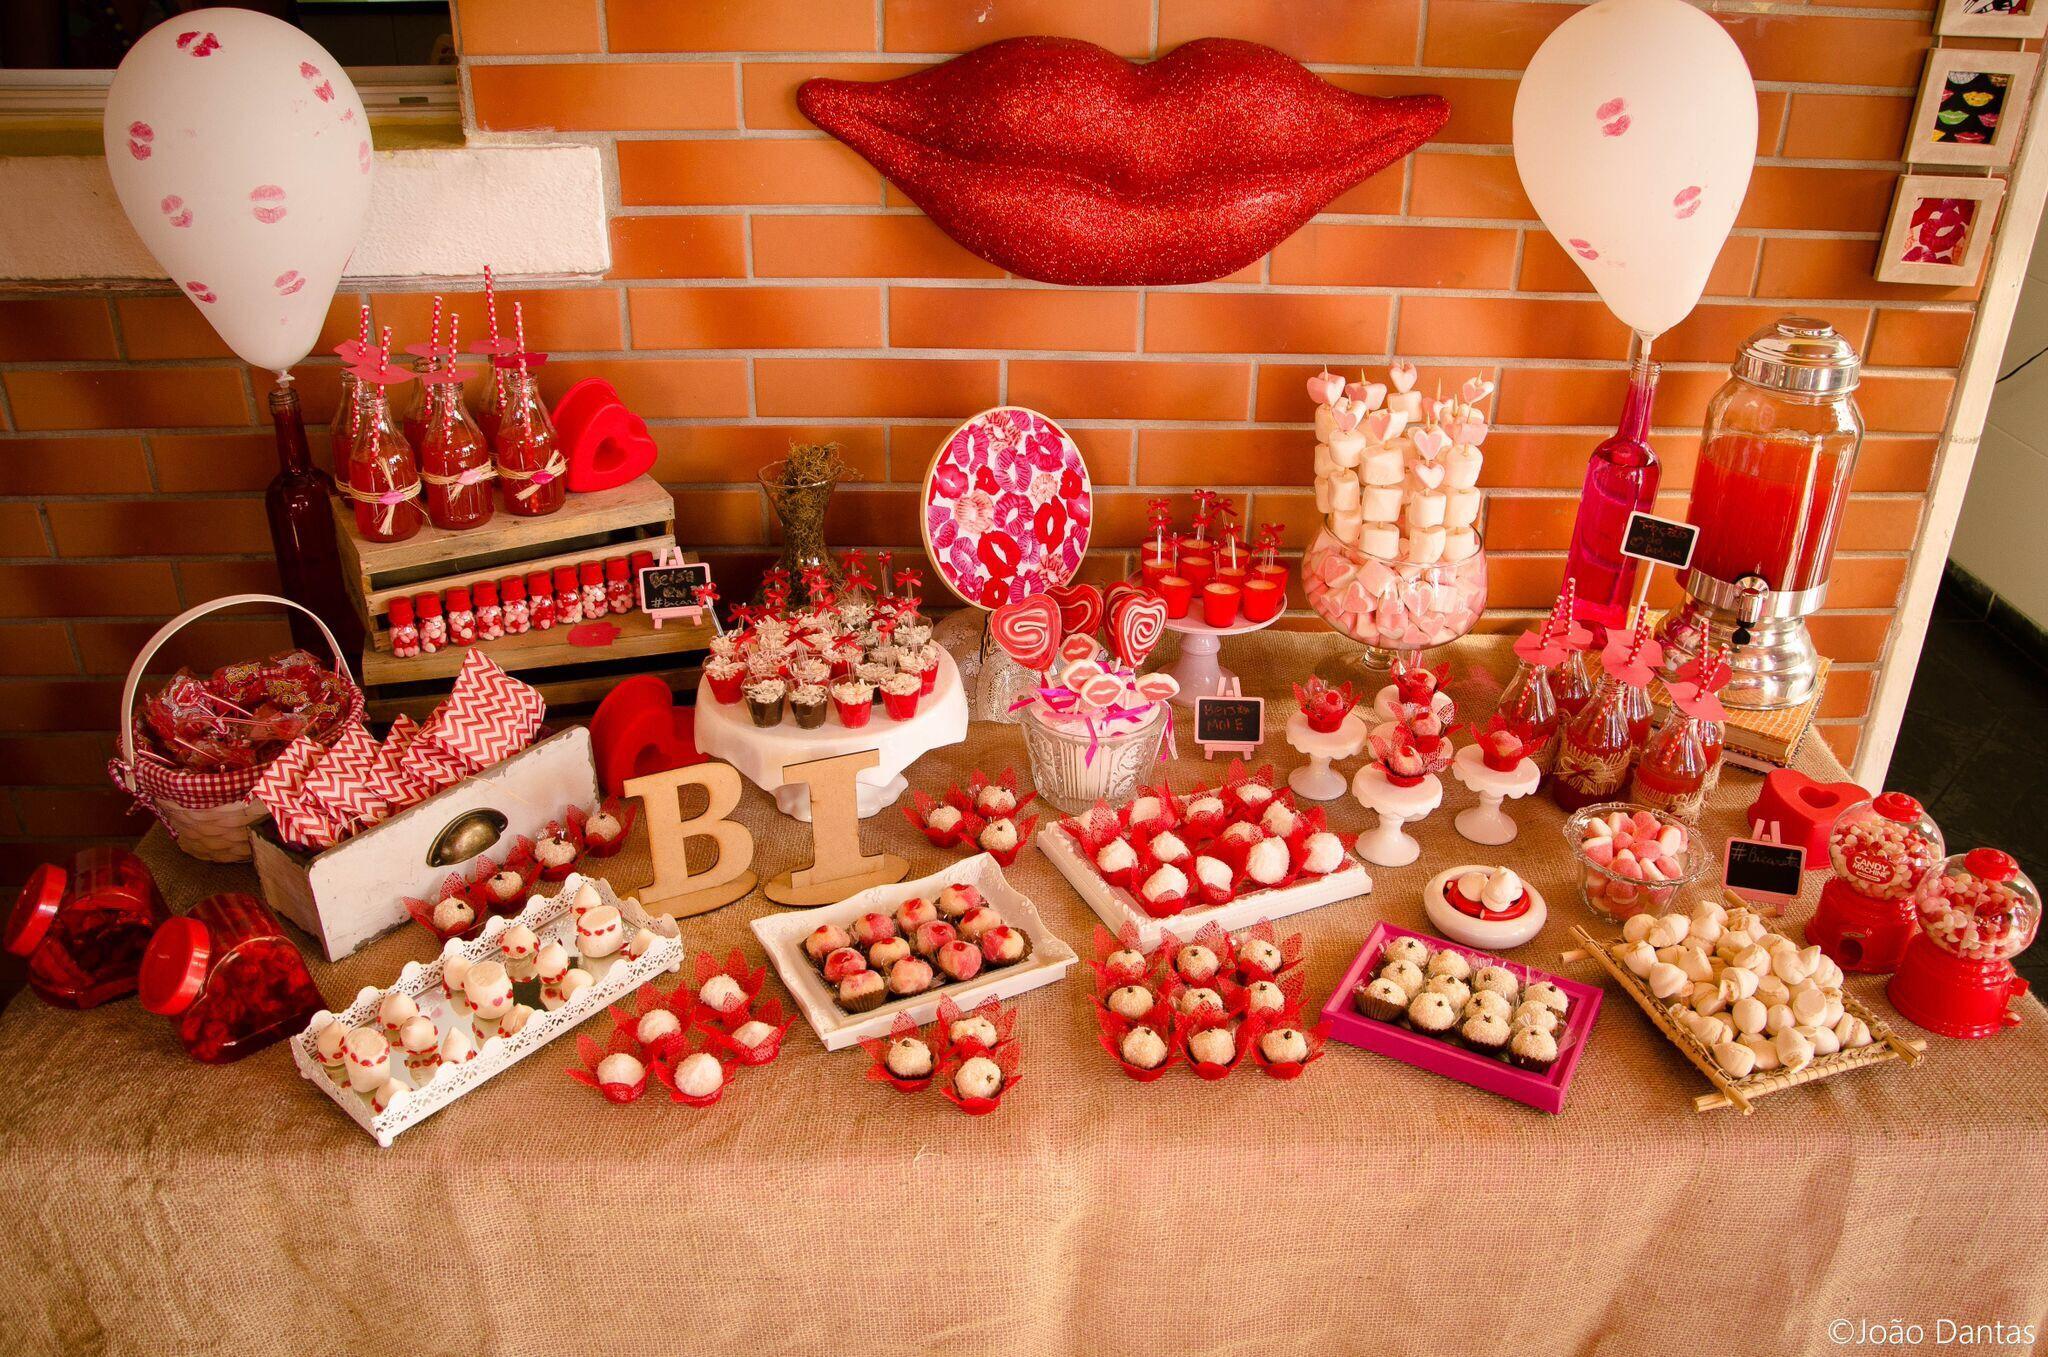 Festa Beijo | Tudo Que Me Inspira